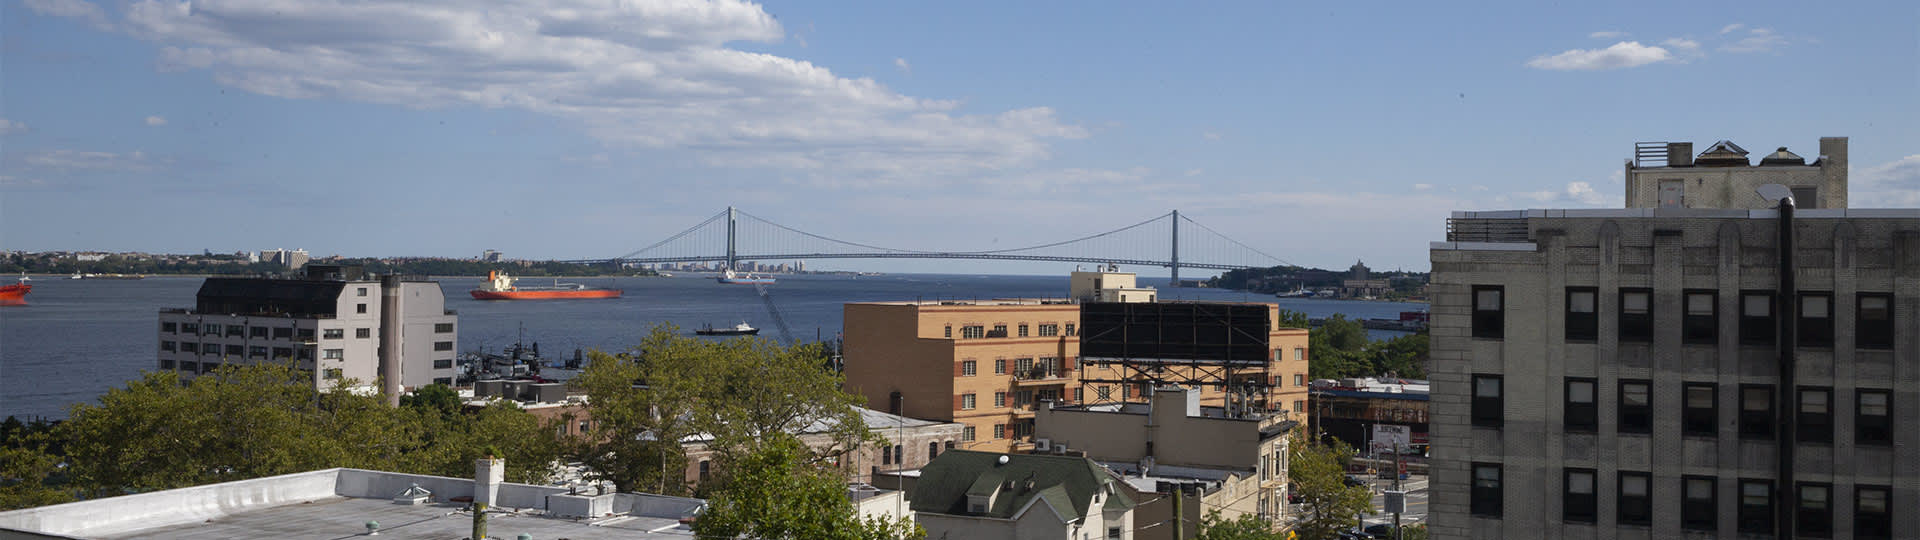 St George, Staten Island, NYC